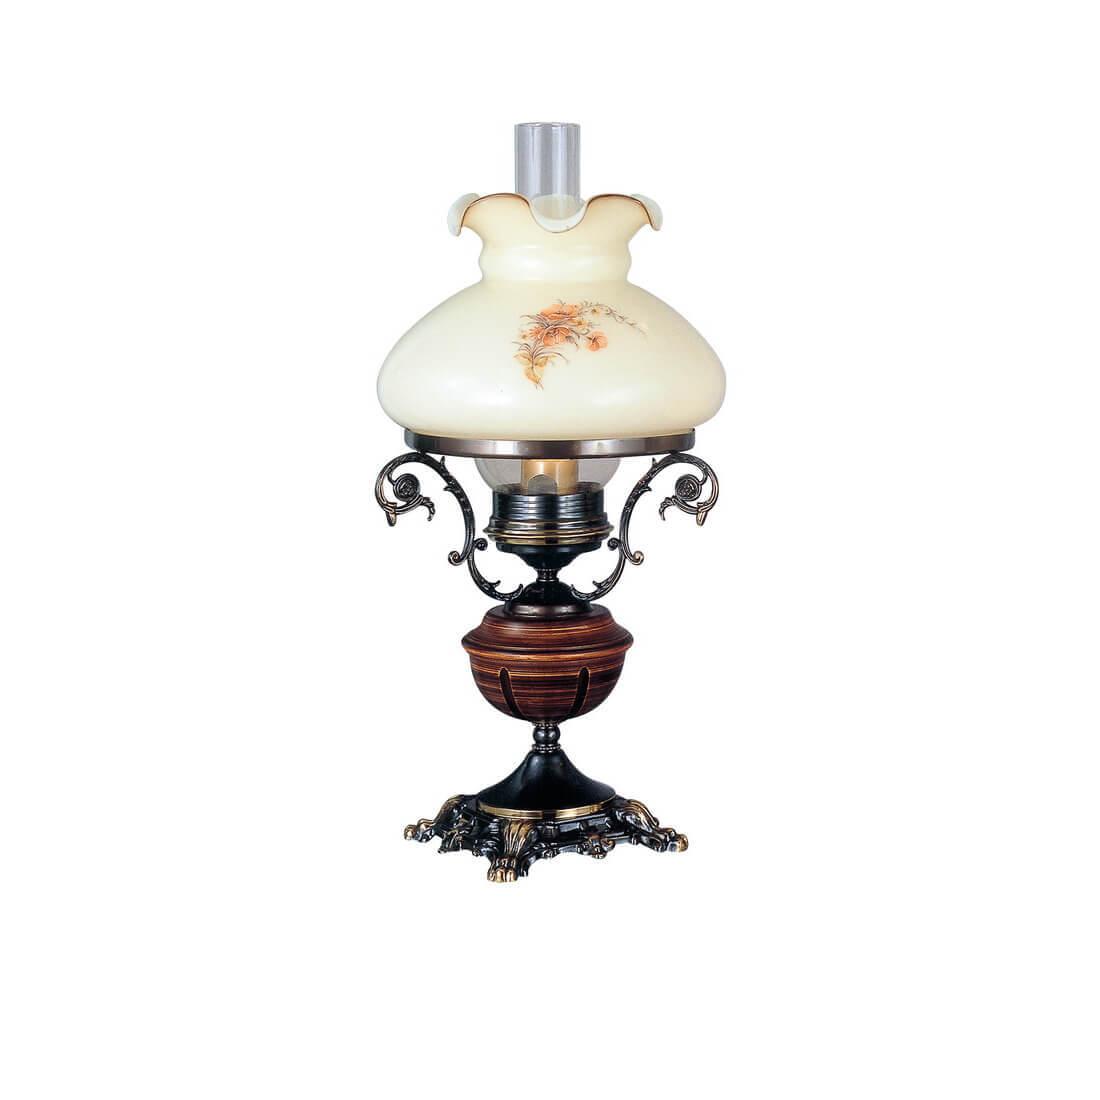 Фото Настольная лампа декоративная Reccagni Angelo 2400 P 2400 G